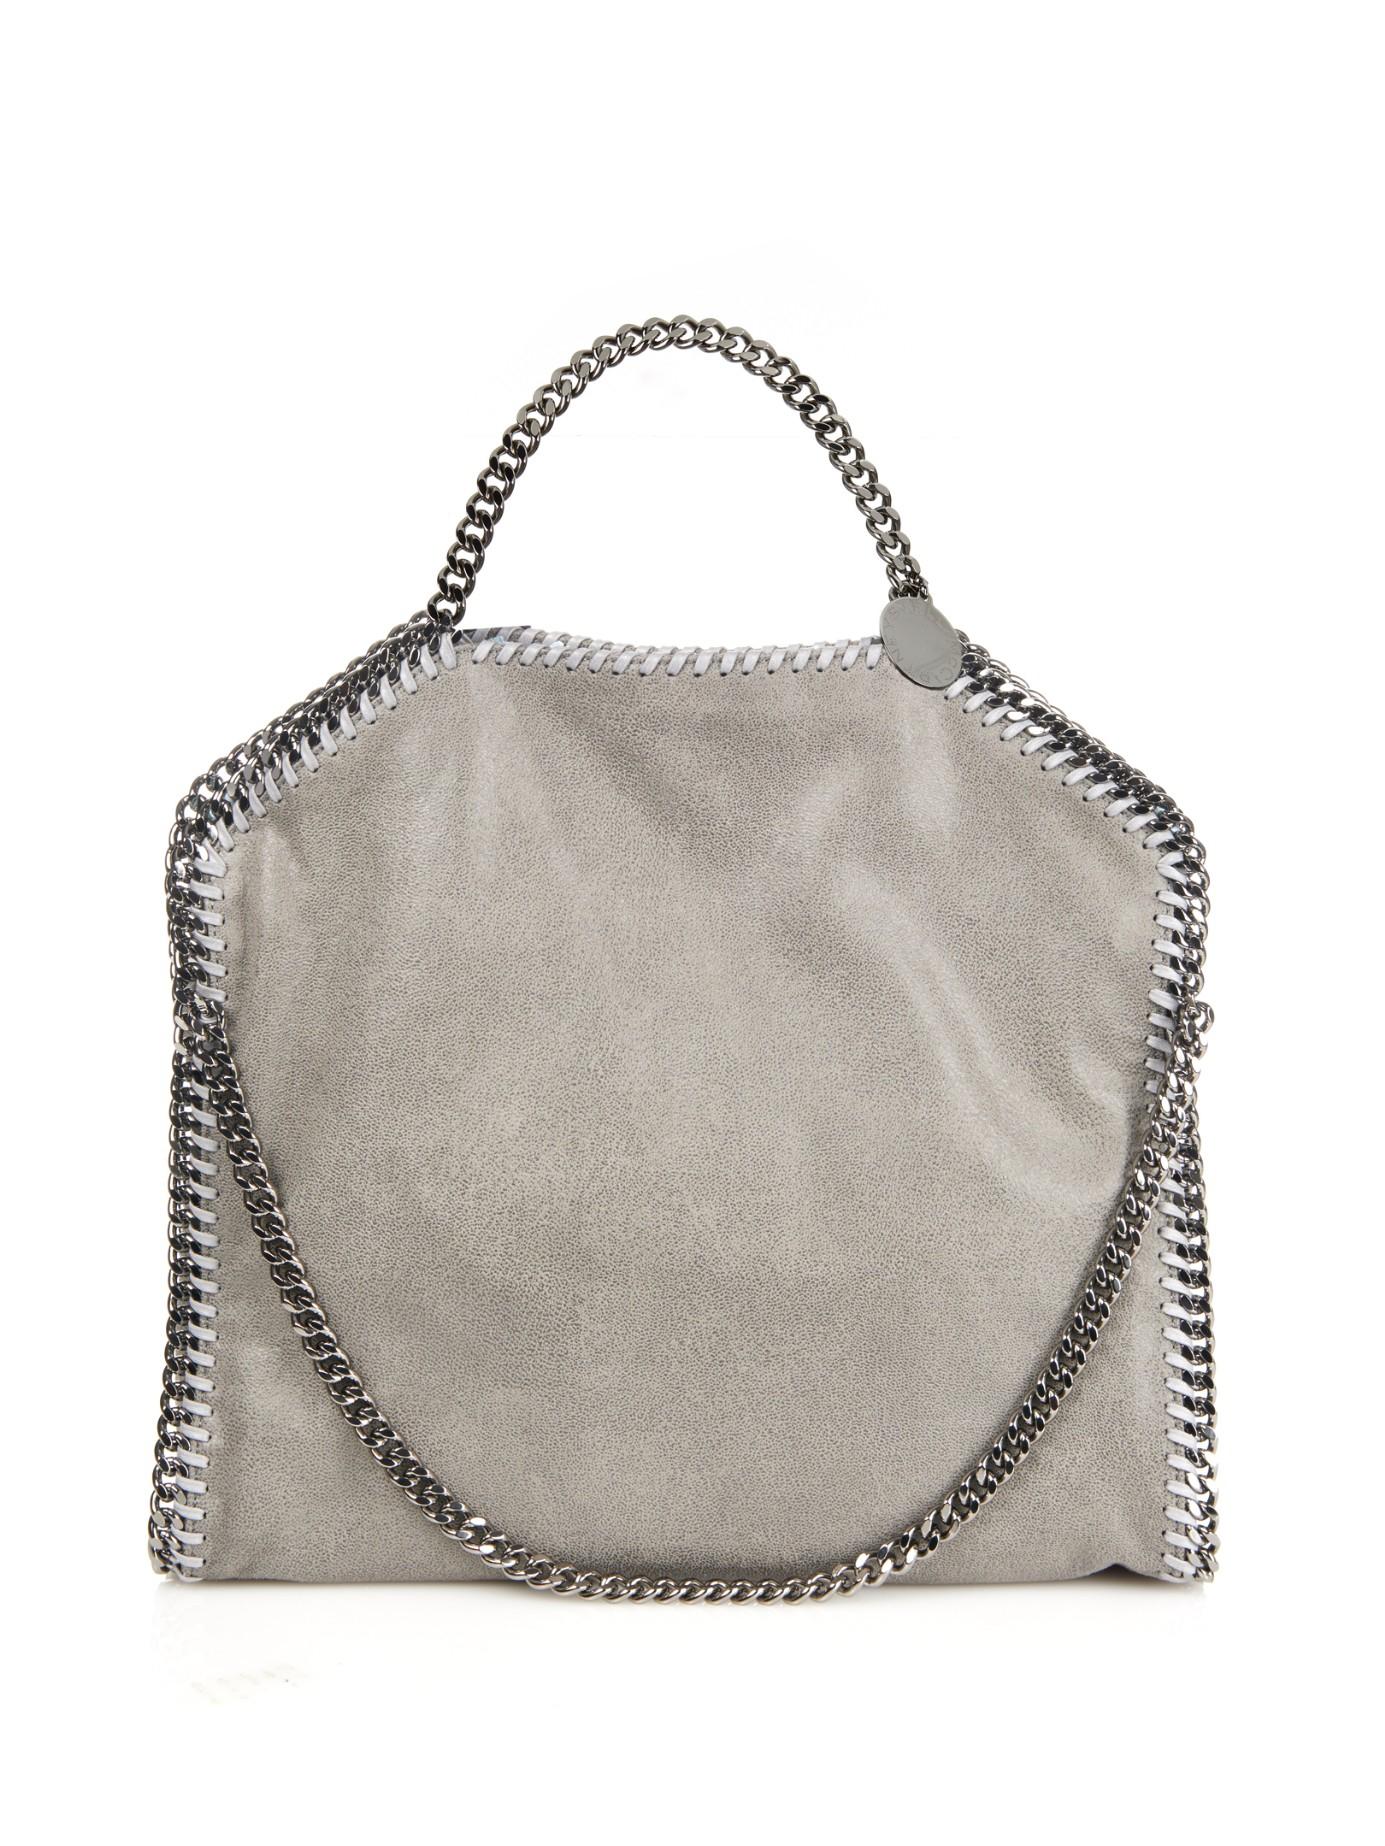 Stella McCartney Falabella Small Faux-suede Shoulder Bag in Gray - Lyst 2f1a39ae05819